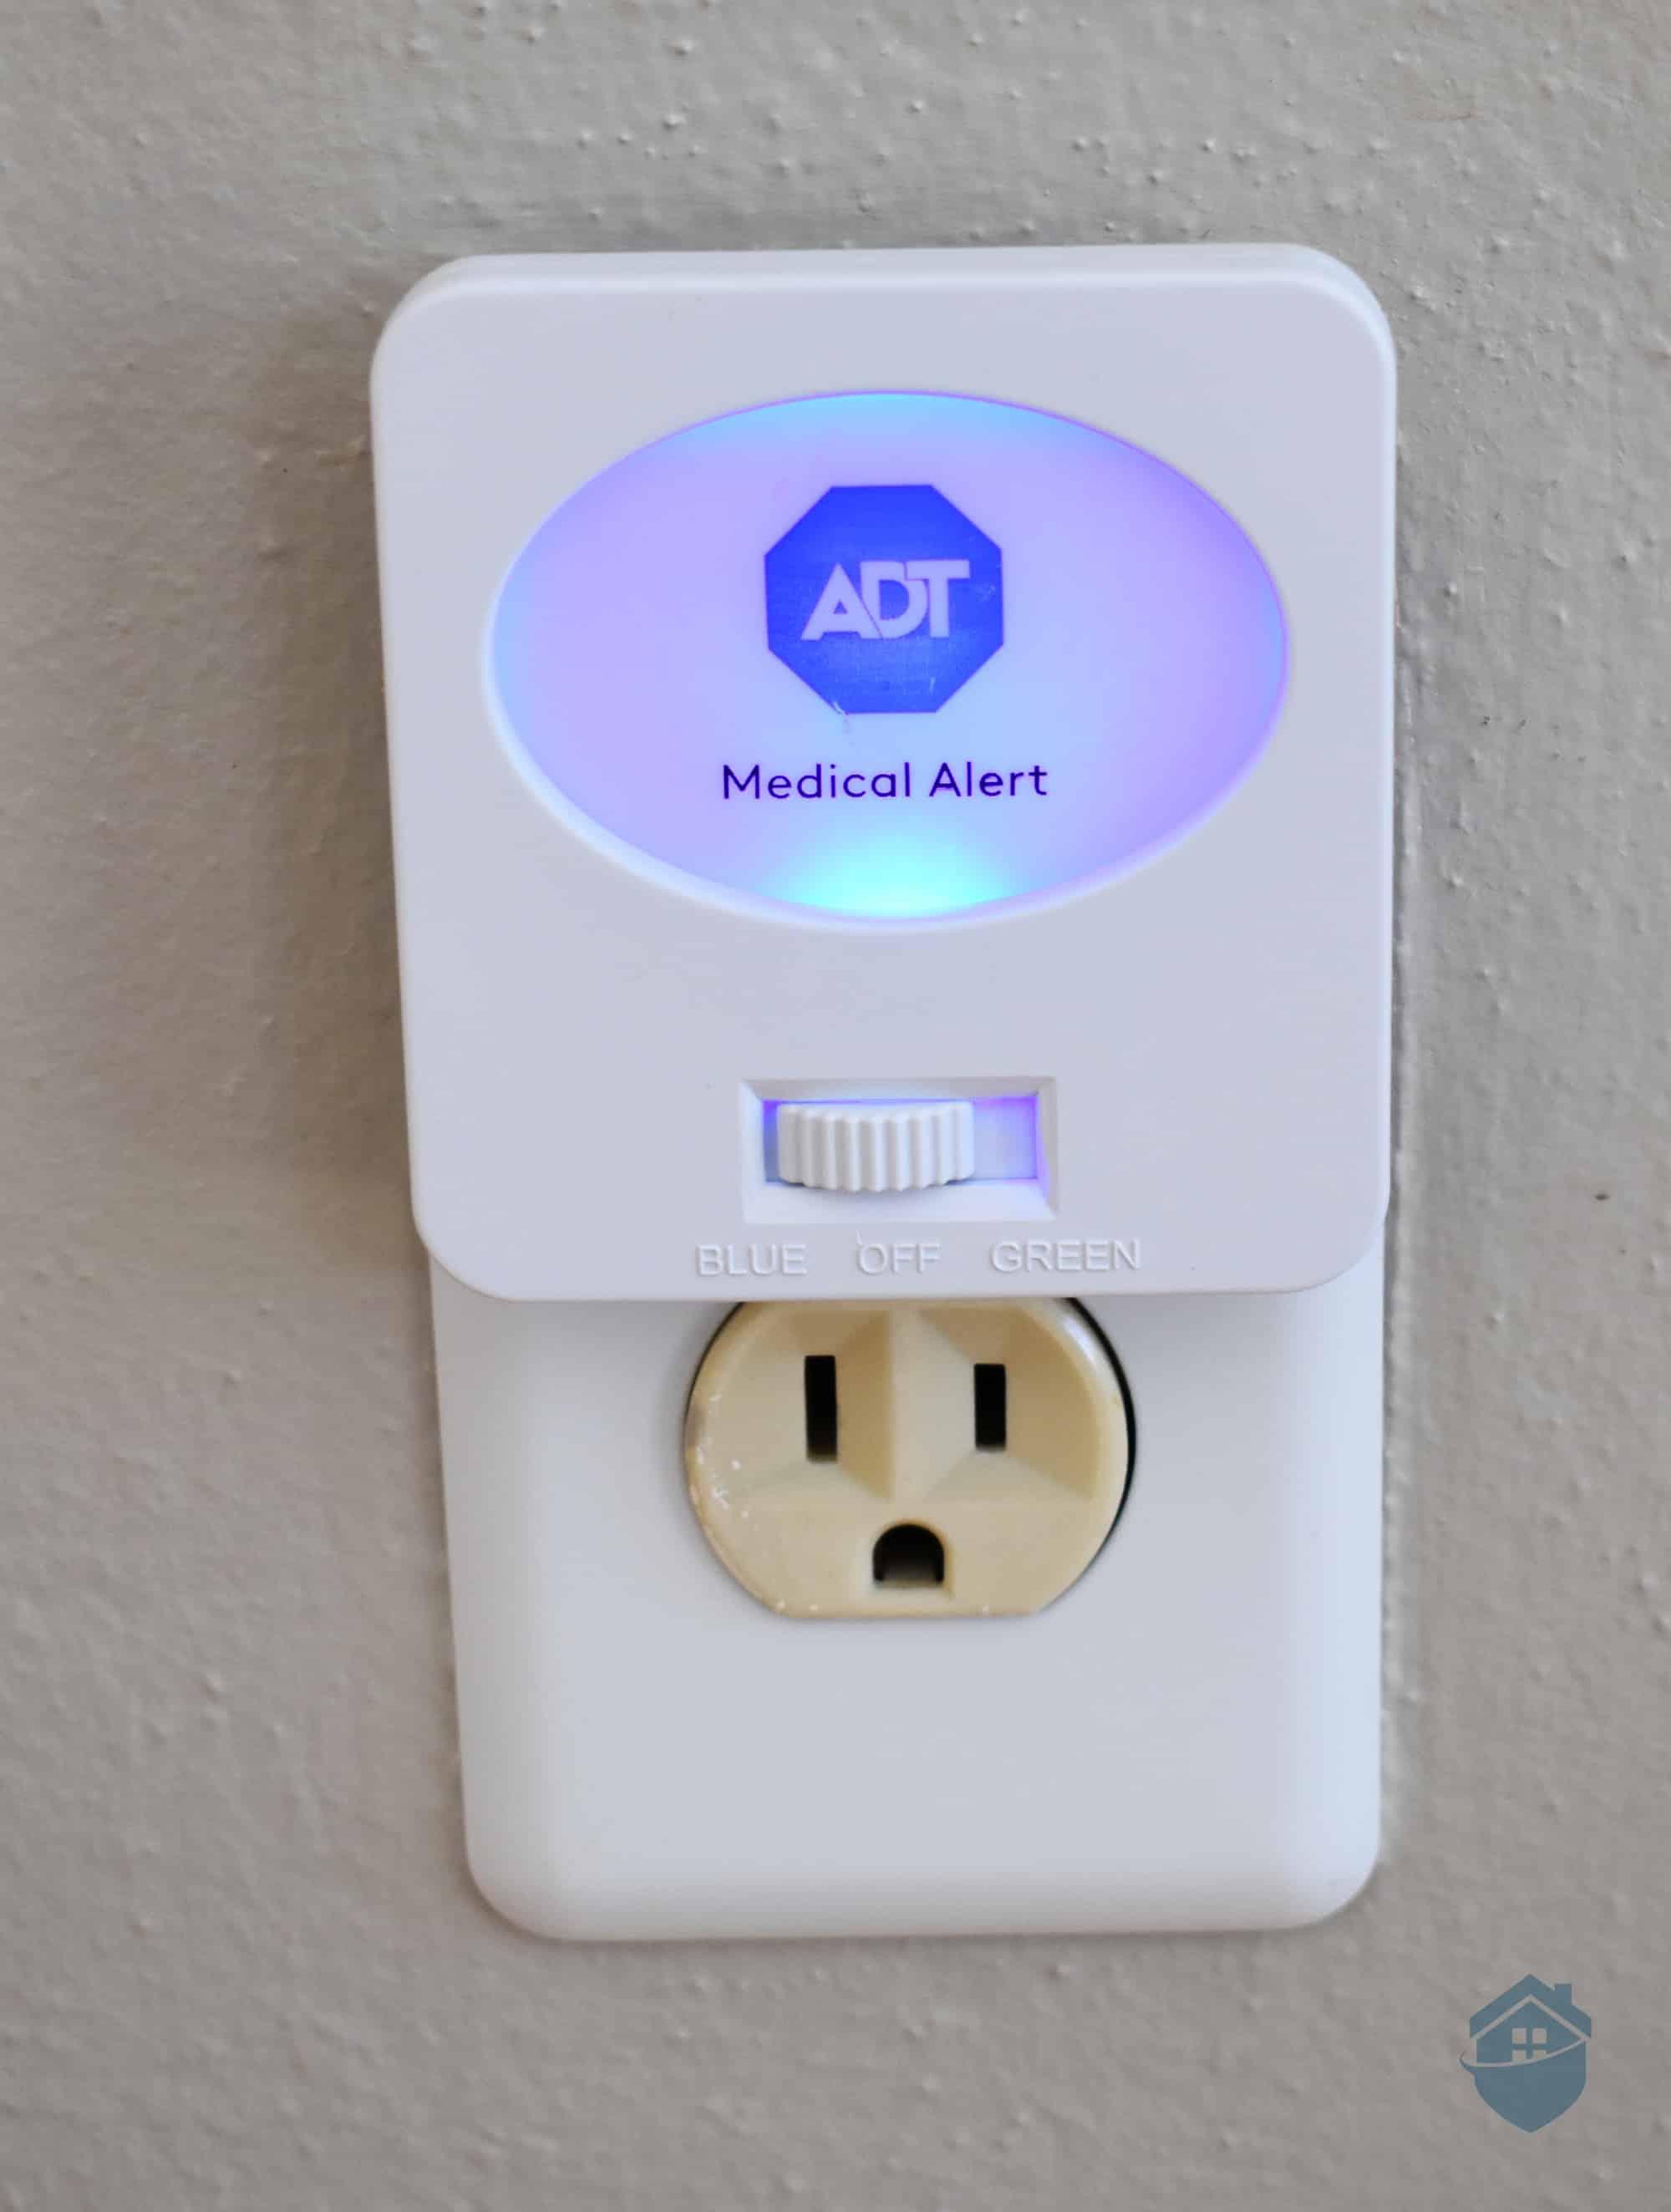 ADT Health Wall Plug